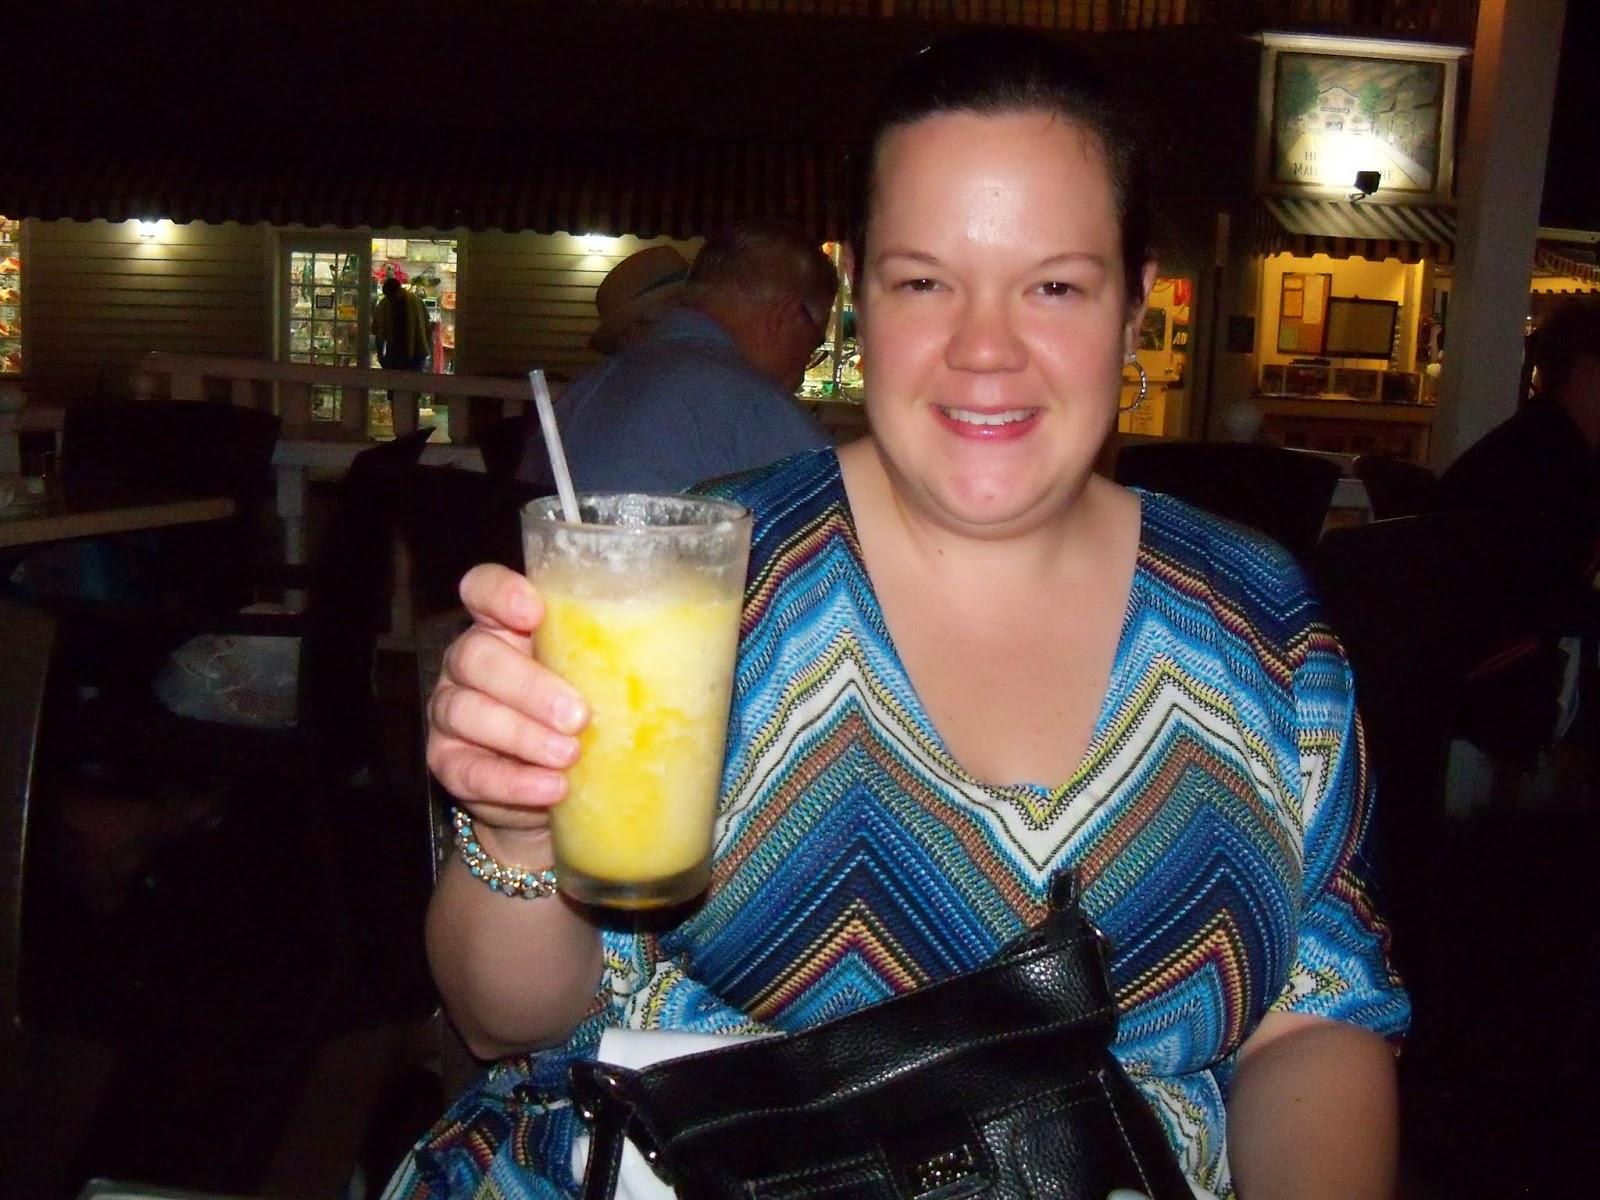 Key West Vacation - 116_5292.JPG